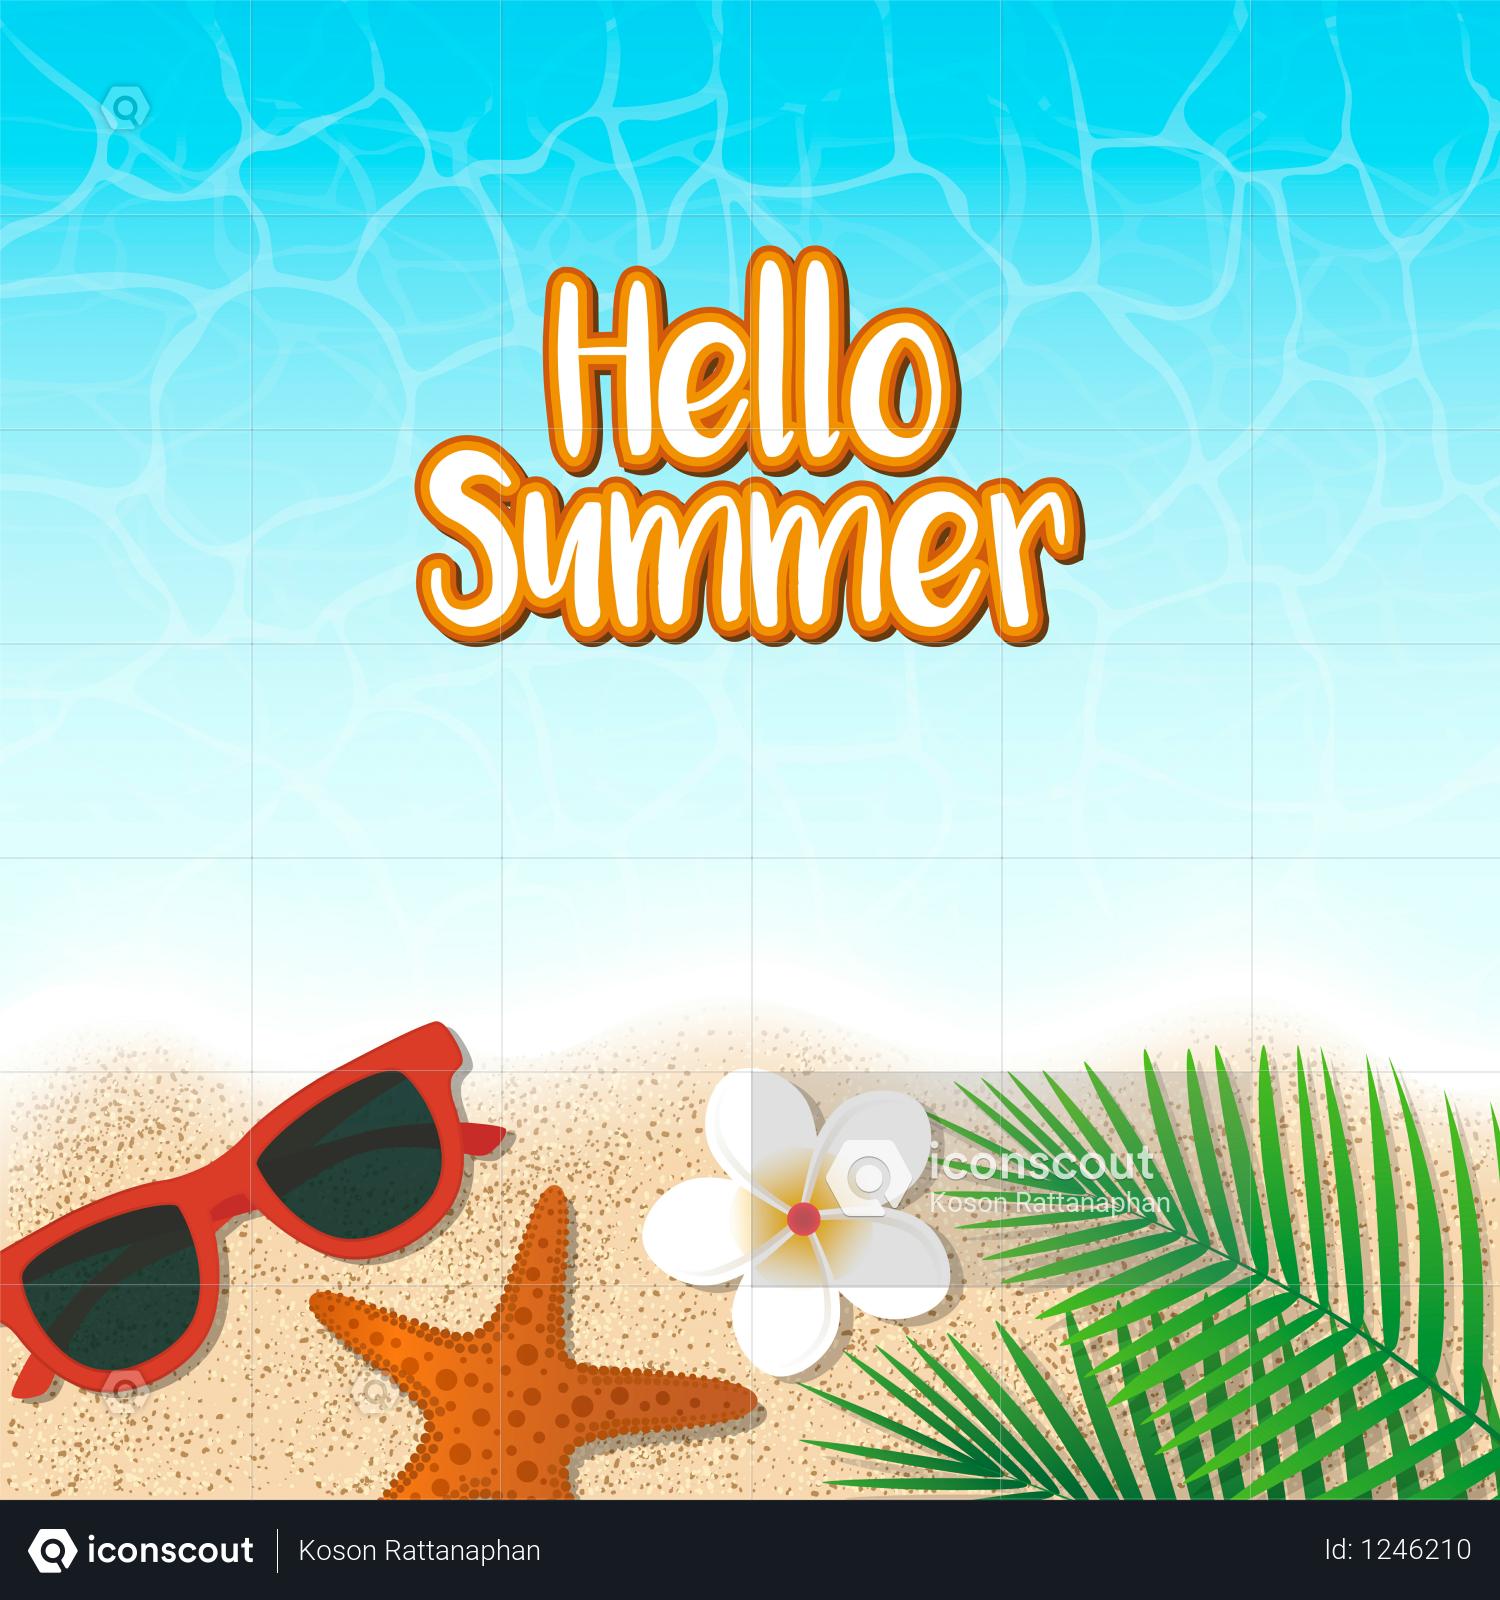 Premium Hello summer holiday background Illustration